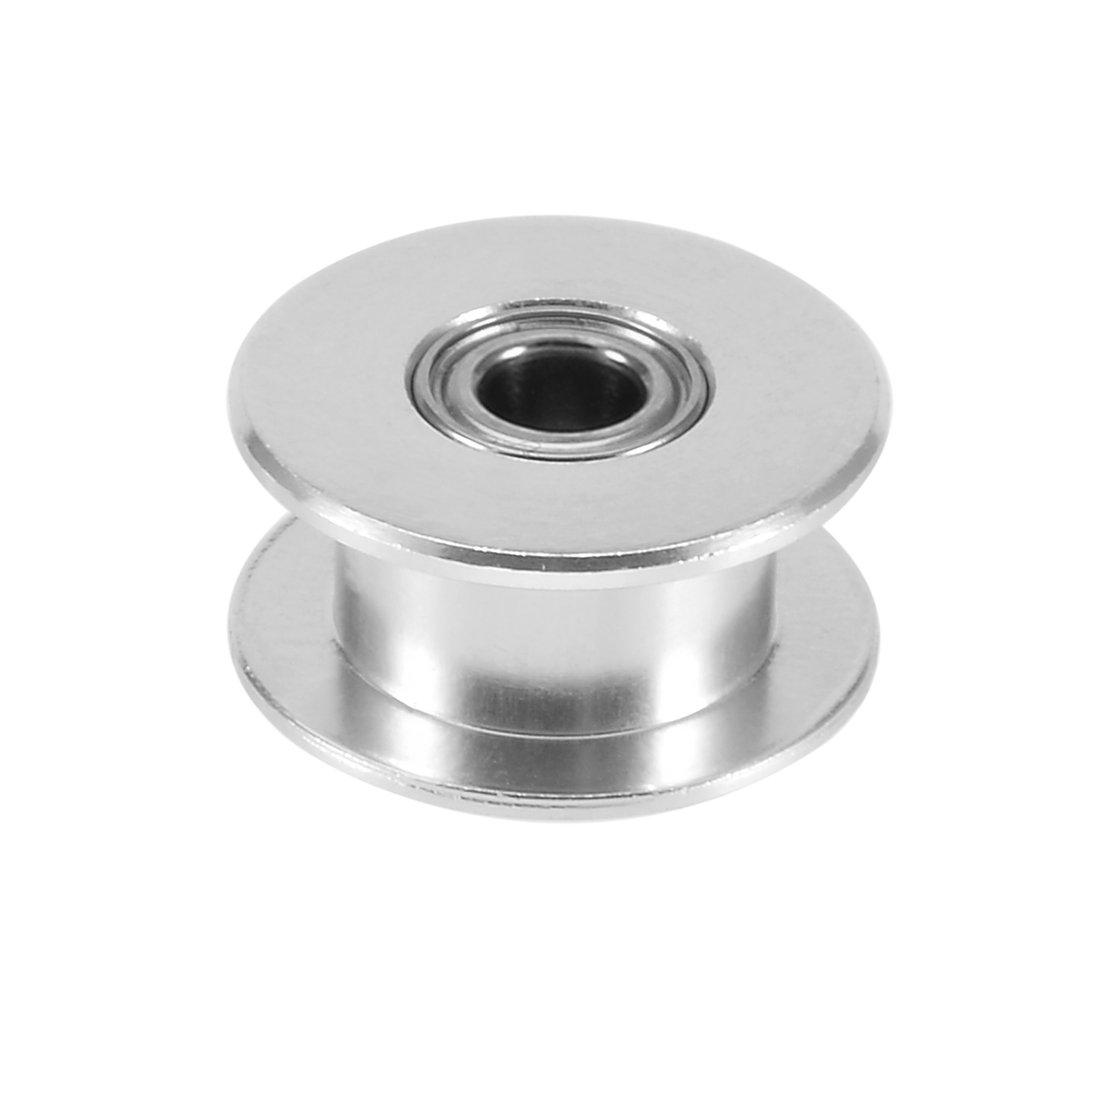 sourcingmap® Aluminium Umschaltrad GT2 for 6mm Draht Zahnriemen 5mm Bohrung für 3D-Drucker a17041300ux0111